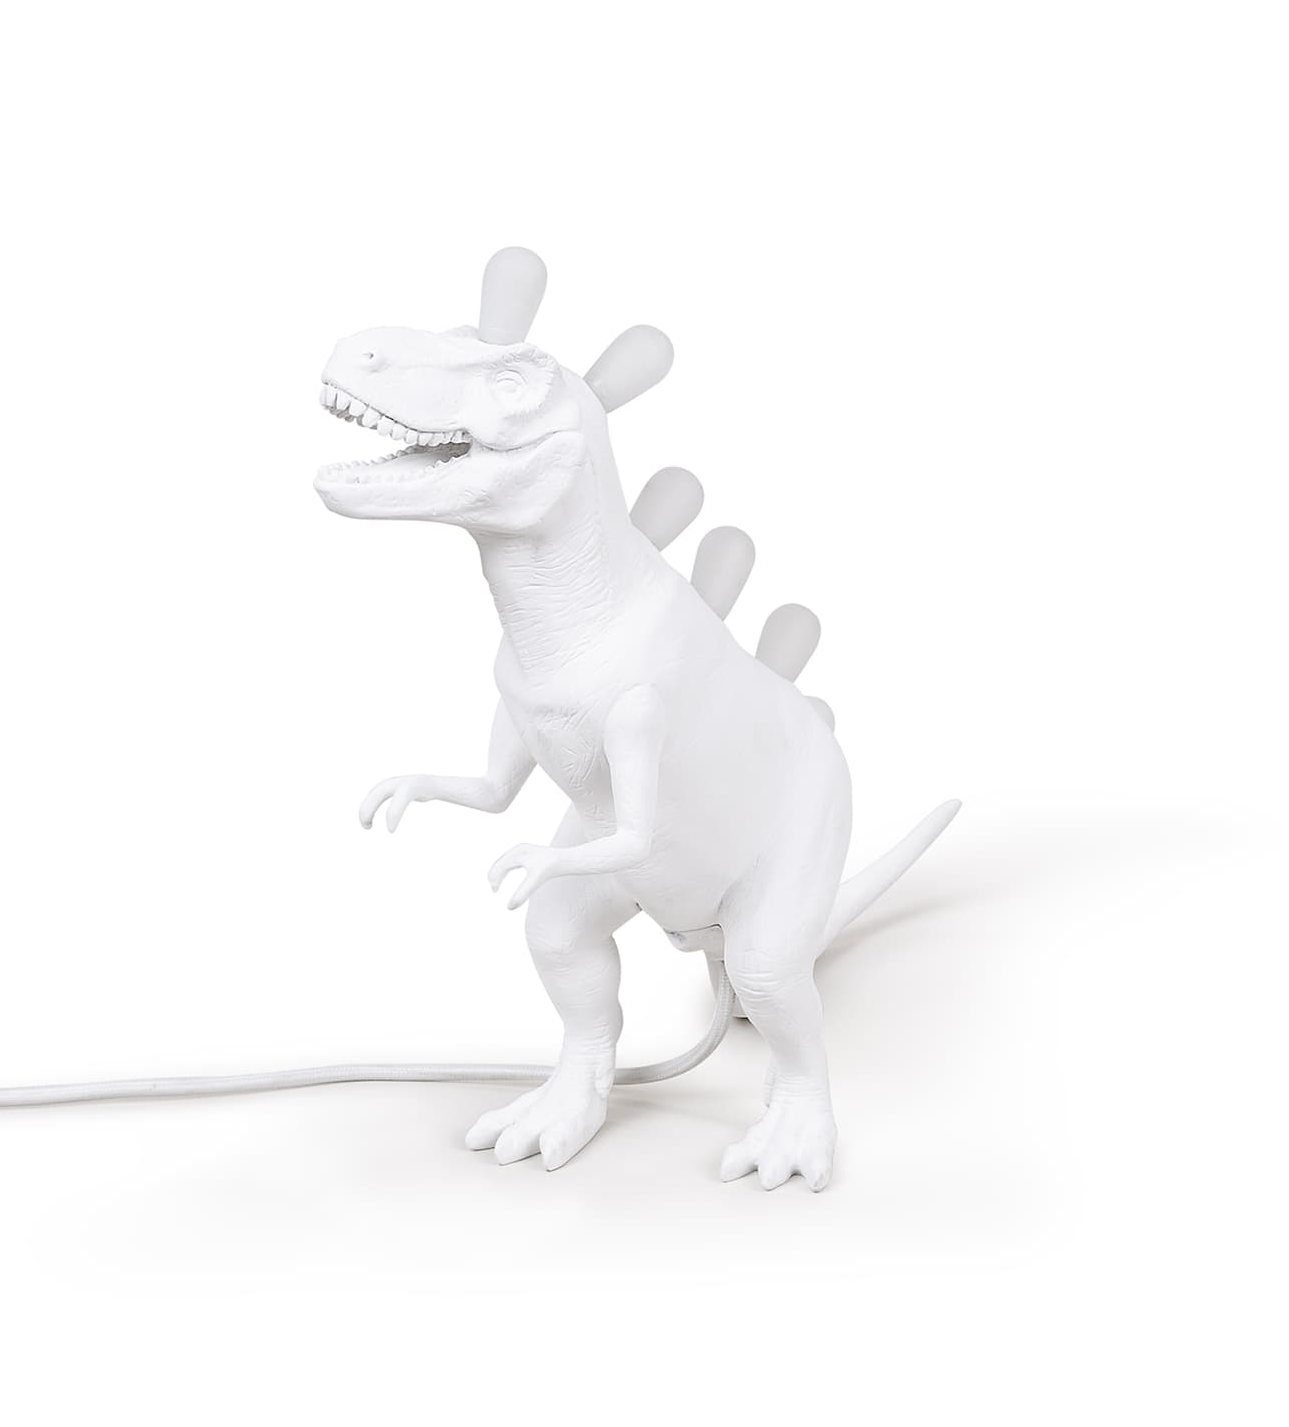 Dinosaurielampa JURASSIC LAMP REX, Seletti